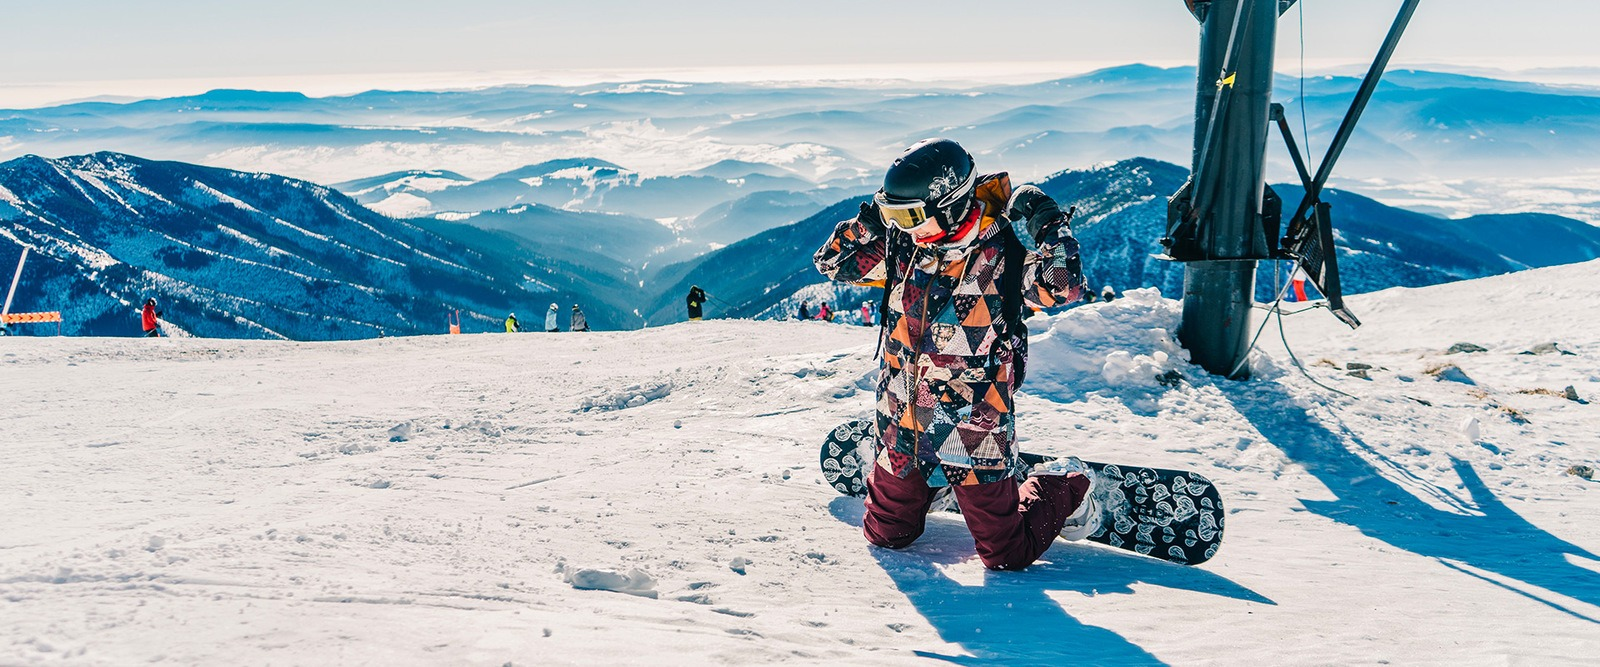 Snowboard - Alpe Cimbra - Trentino